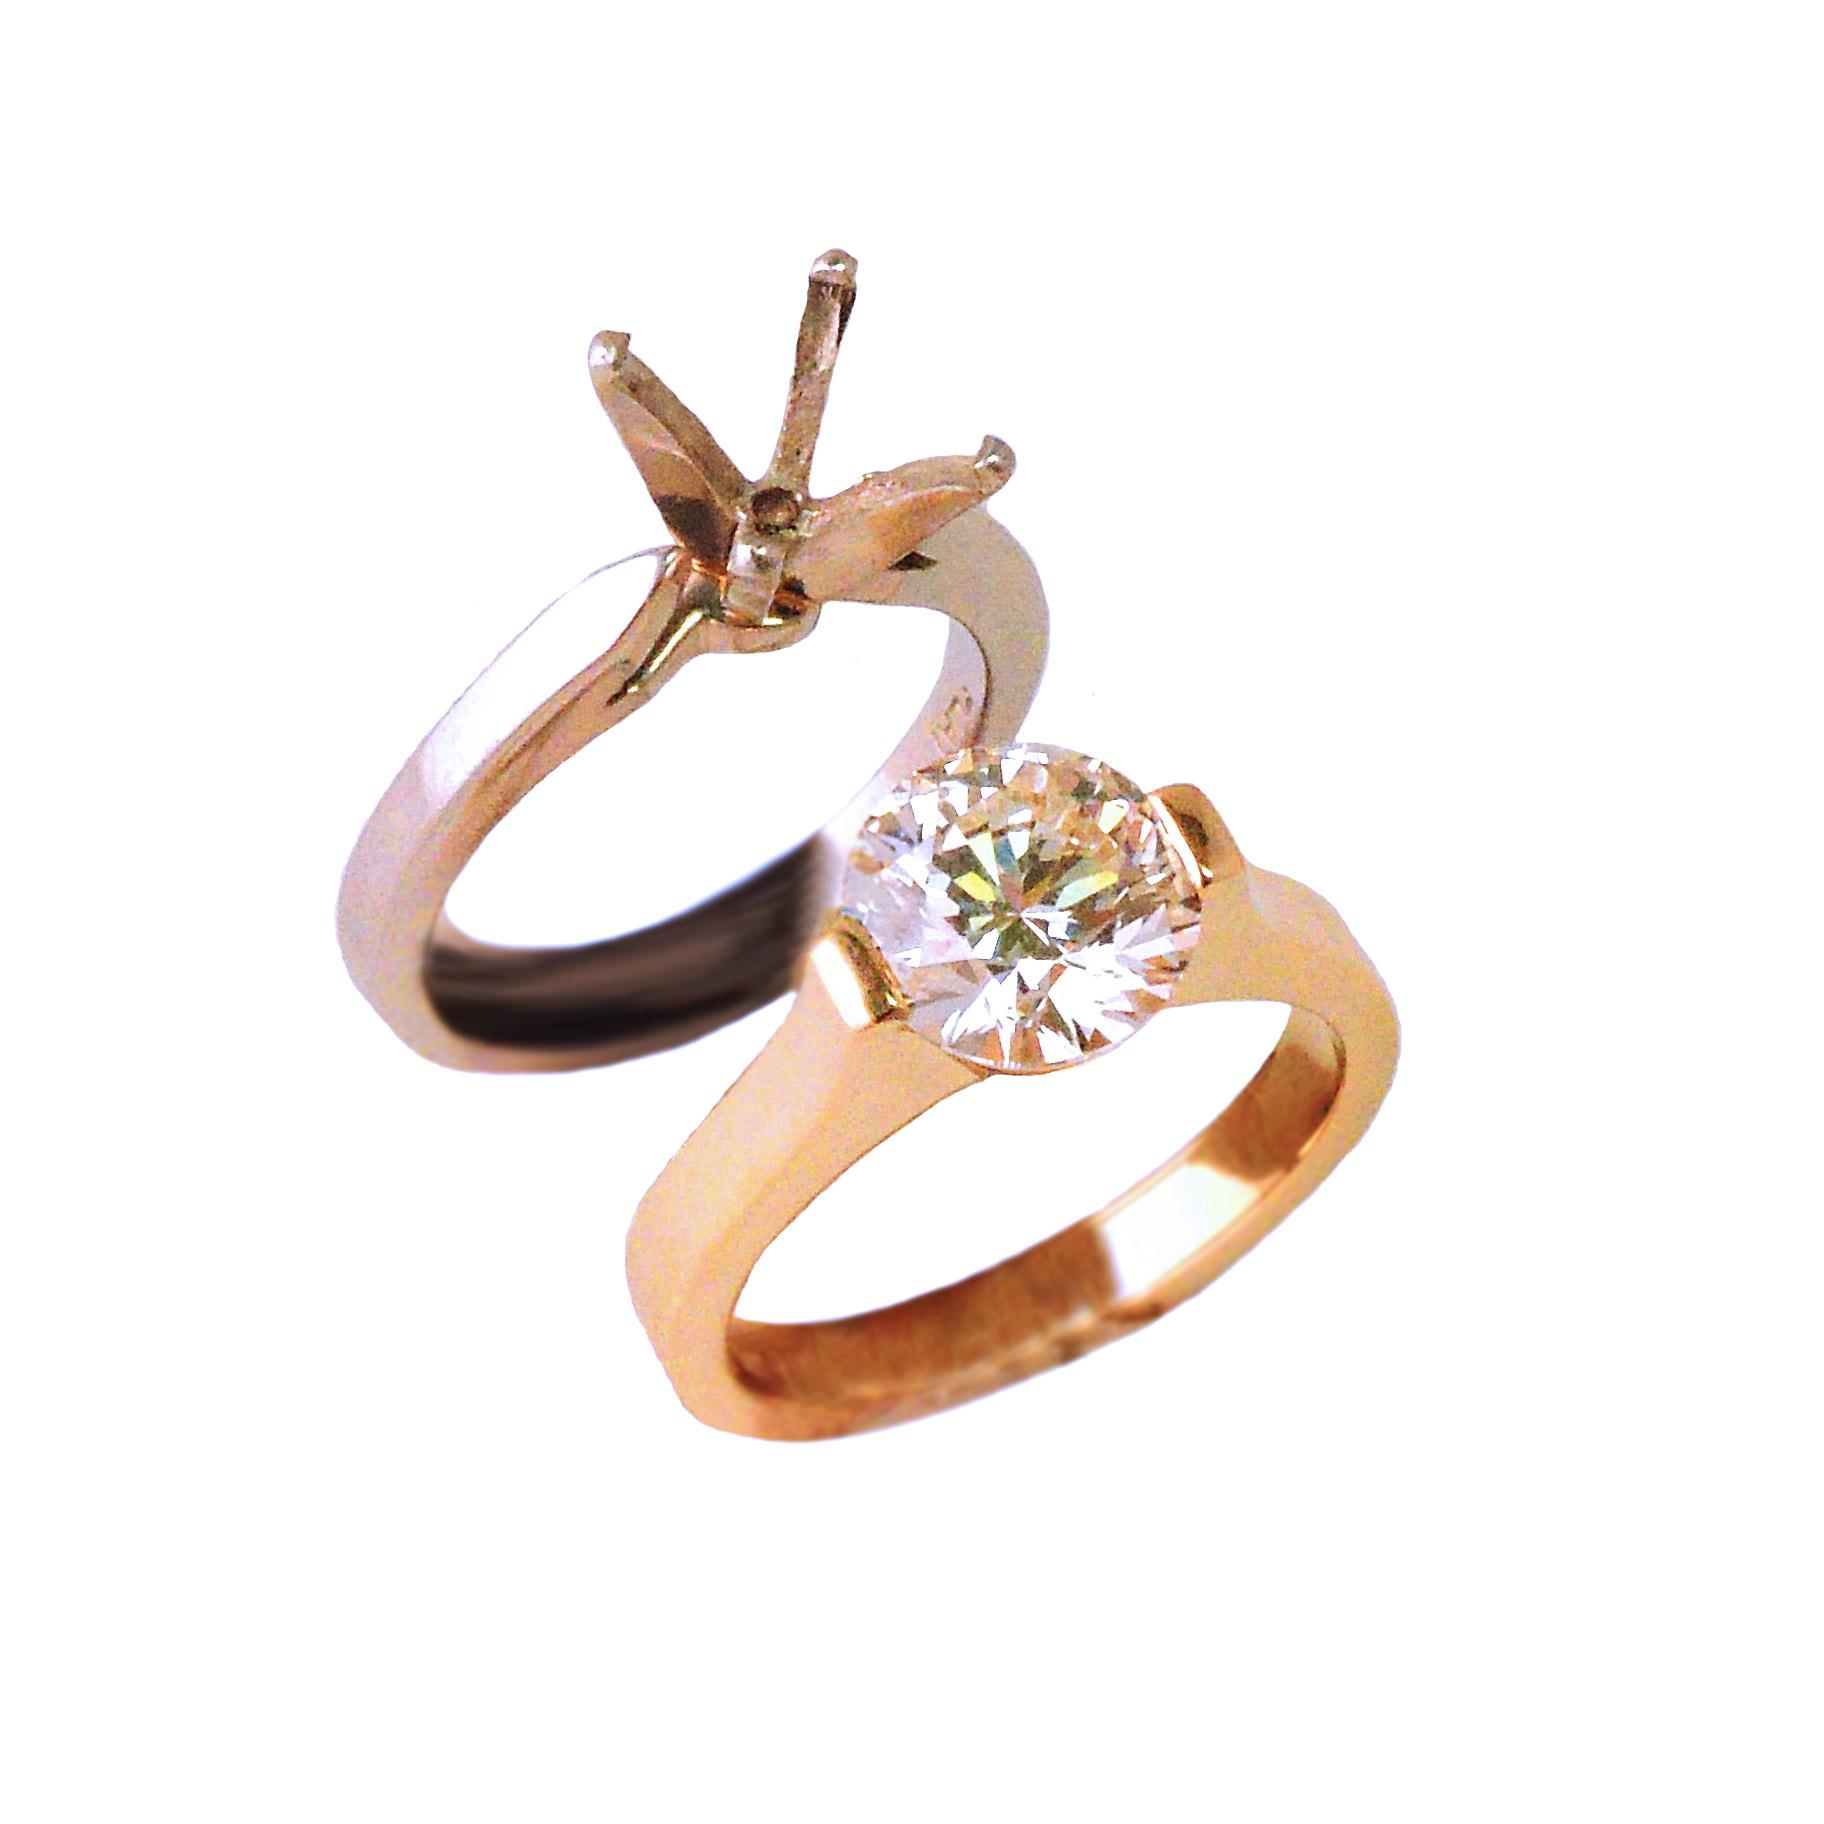 1.5ct Canadian Diamond Ring